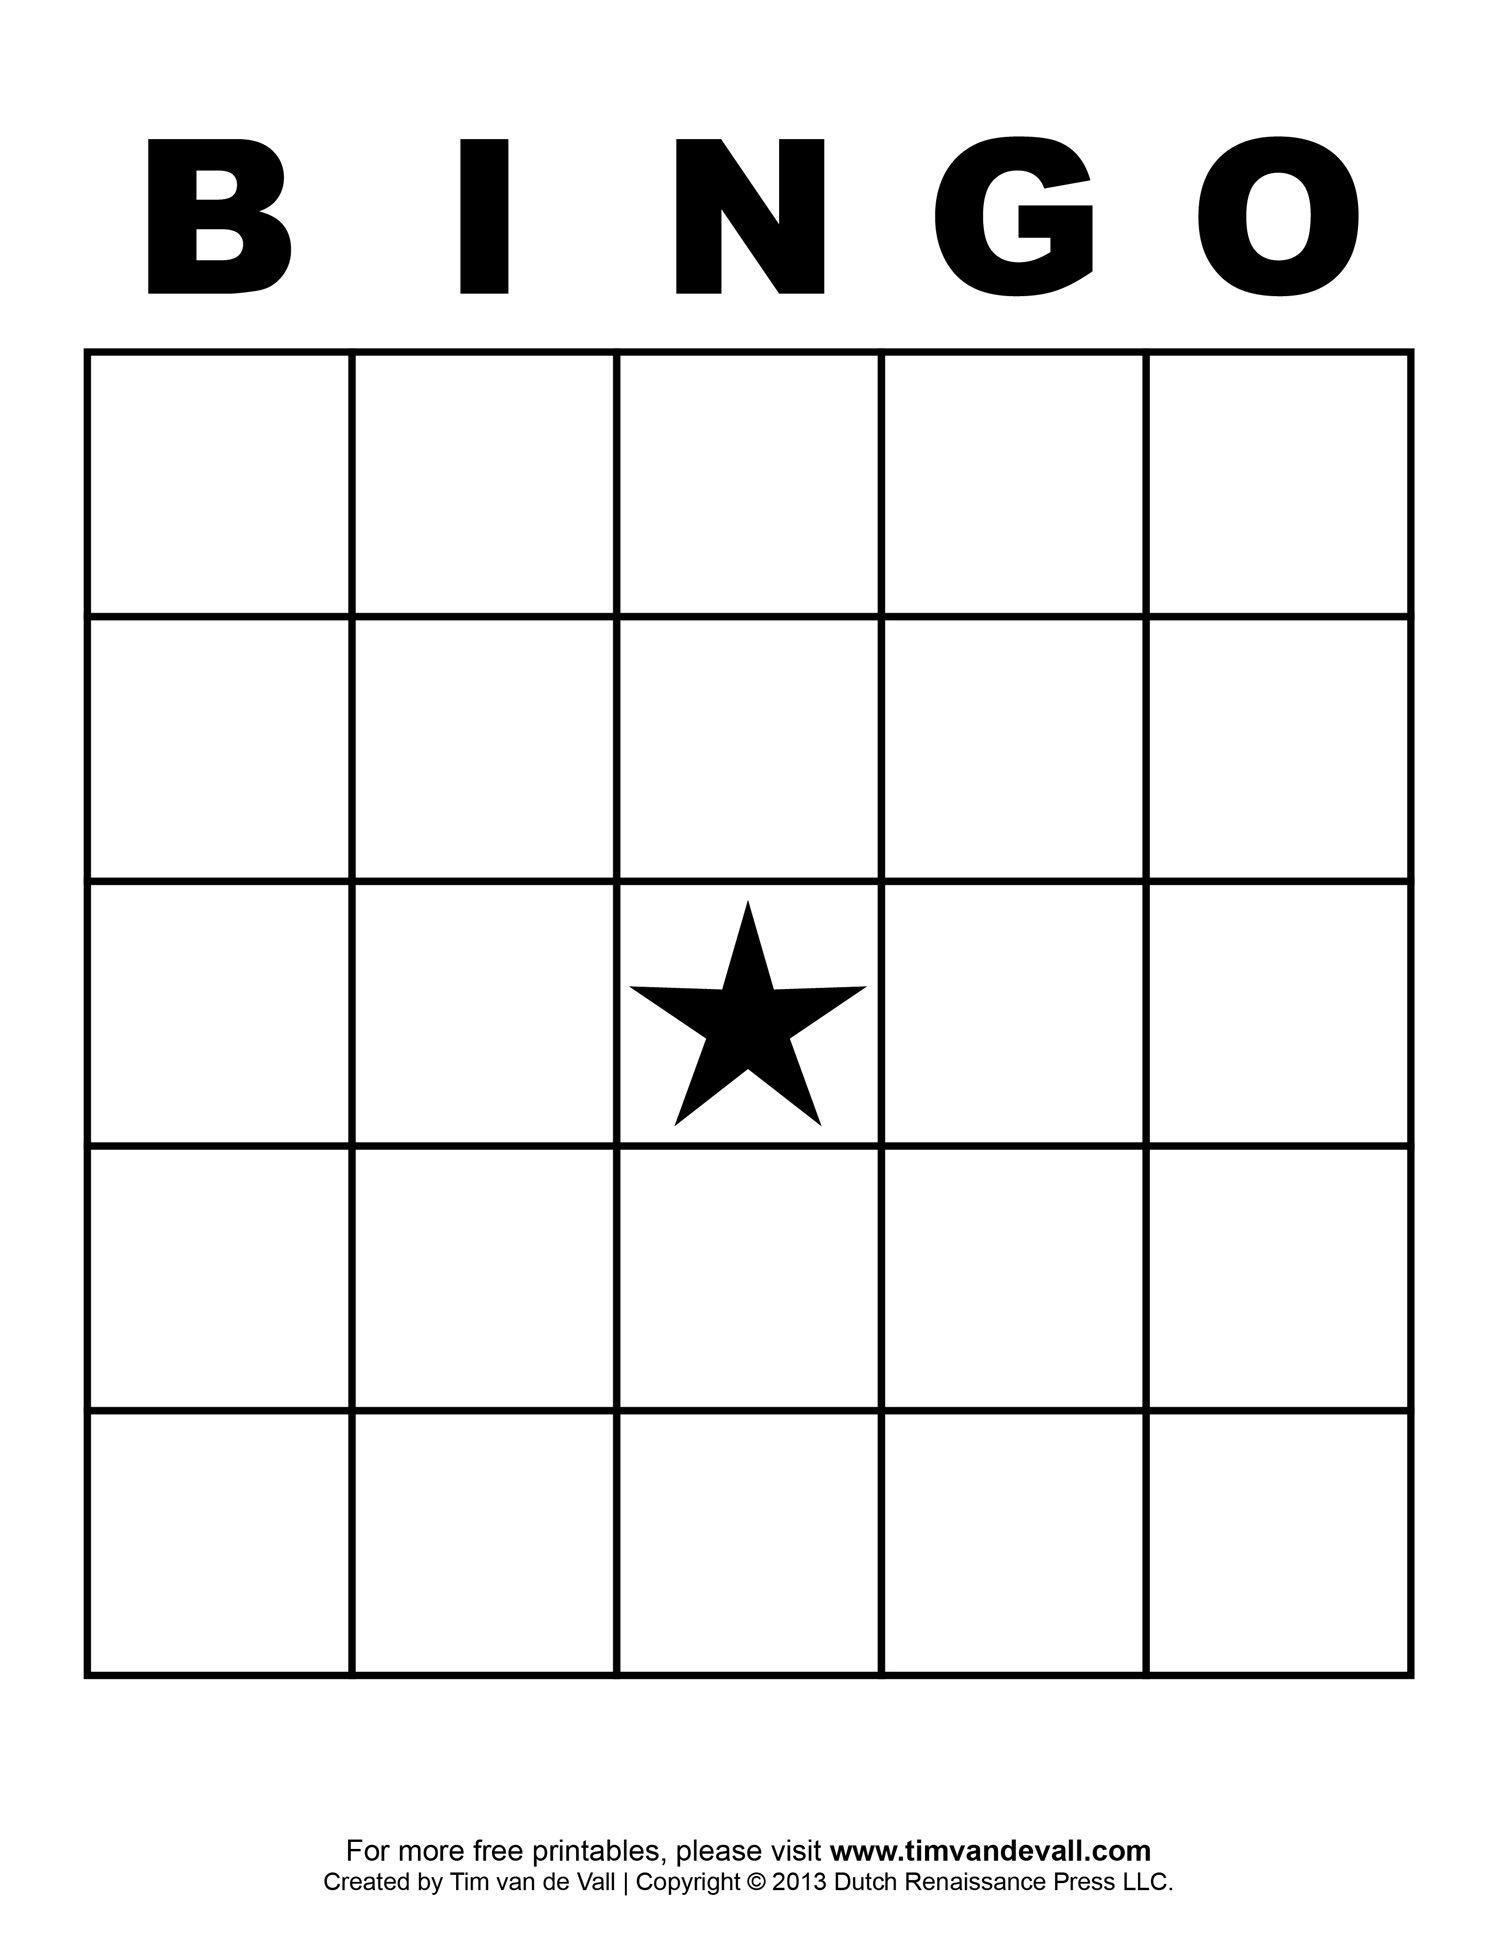 Free Printable Blank Bingo Cards Template 4 X 4   Classroom   Blank - Free Printable Bingo Cards For Large Groups